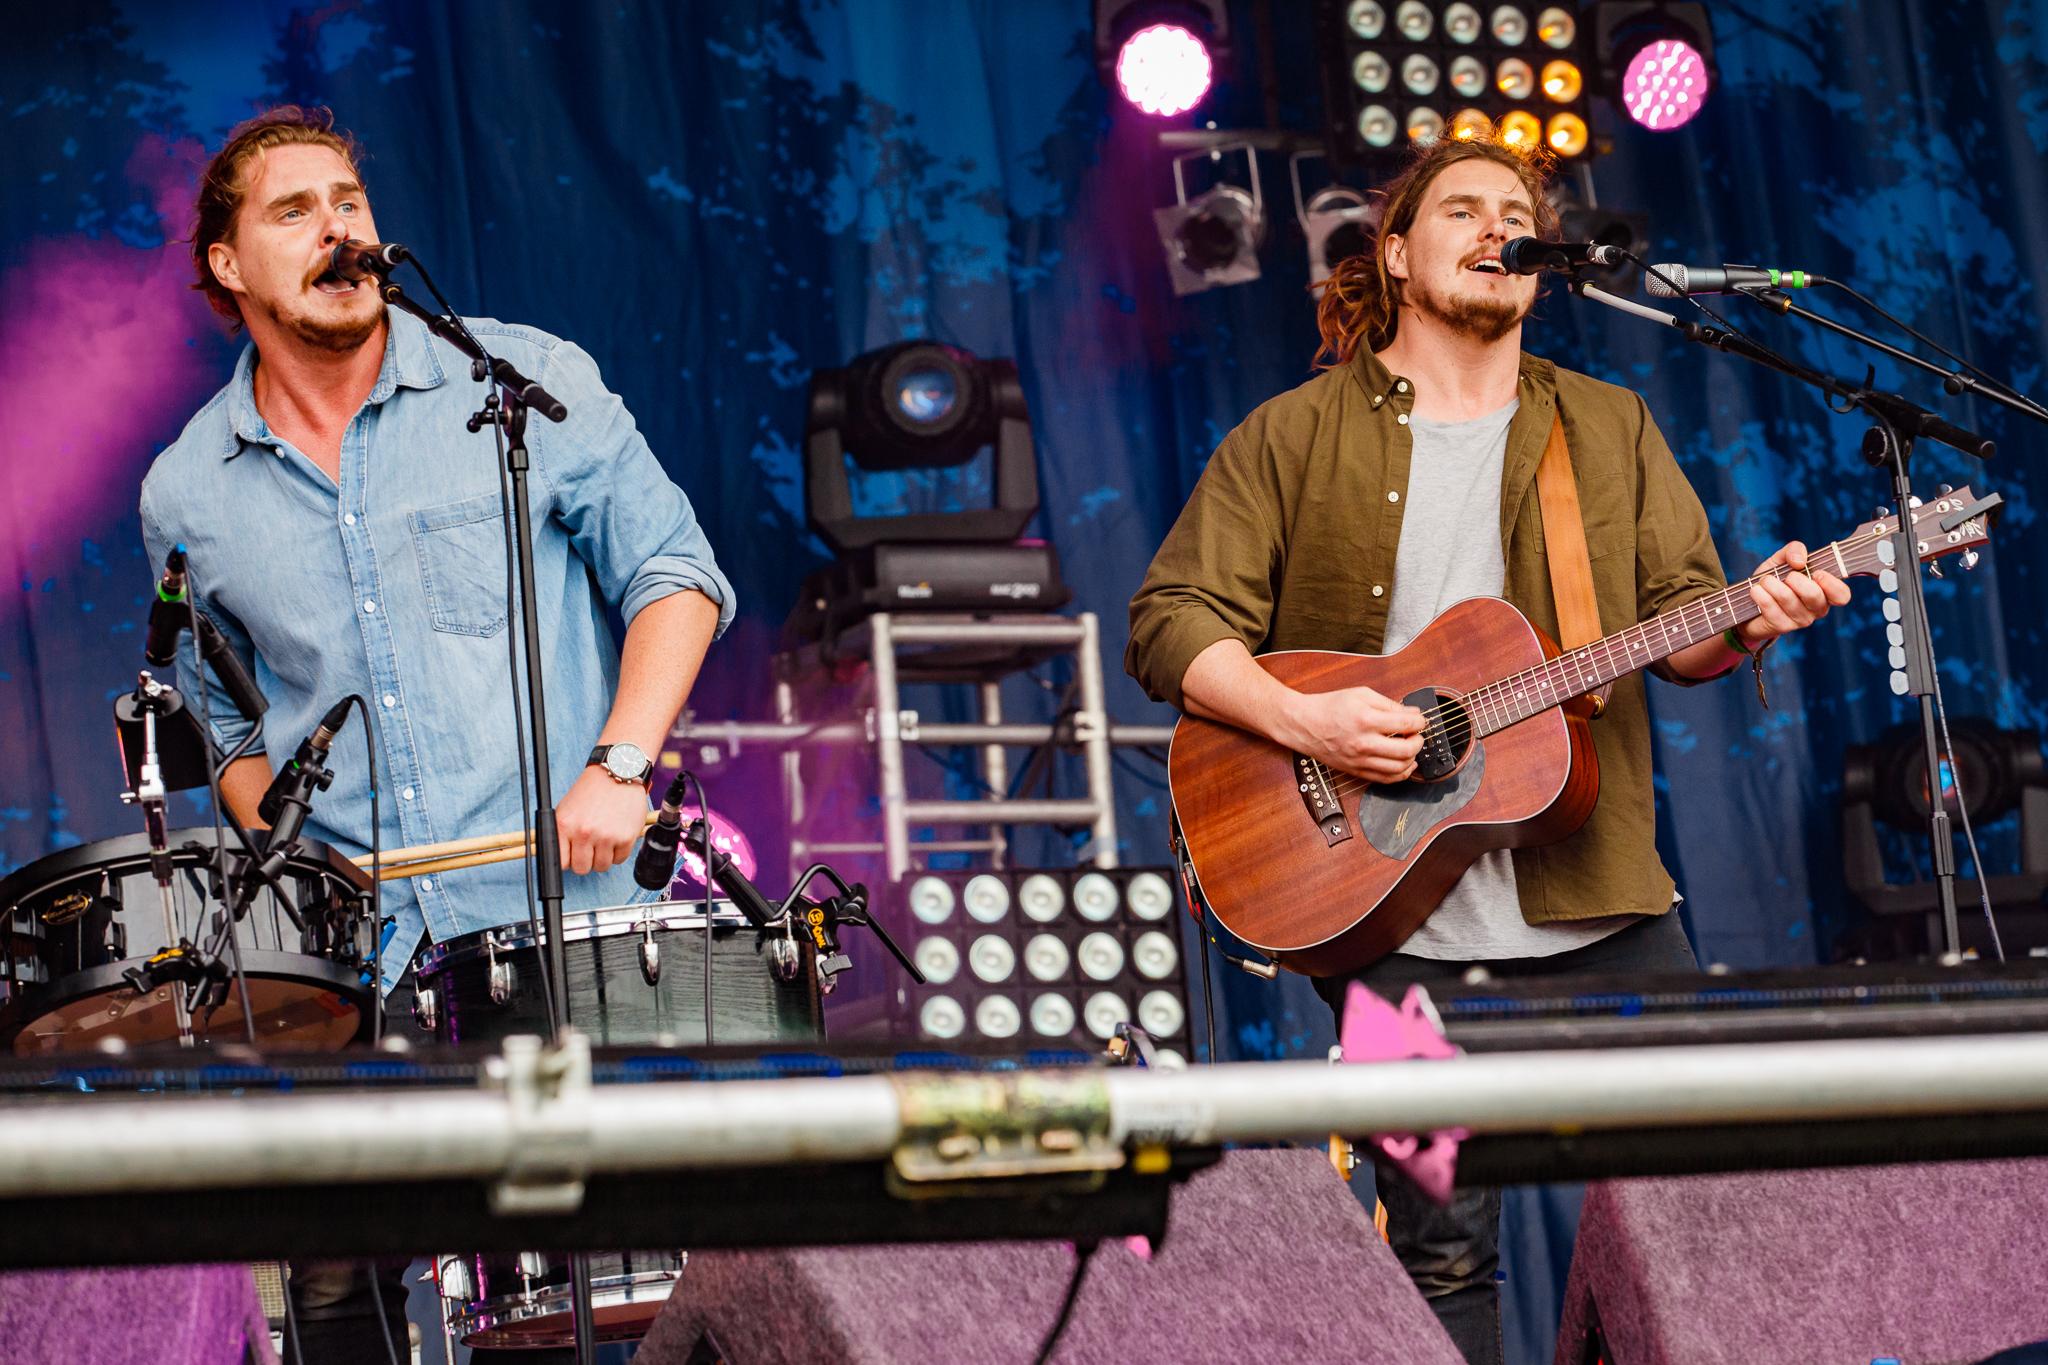 Pierce Brothers at Fairport's Cropredy Convention (photo by Matt Condon / @arcane93)